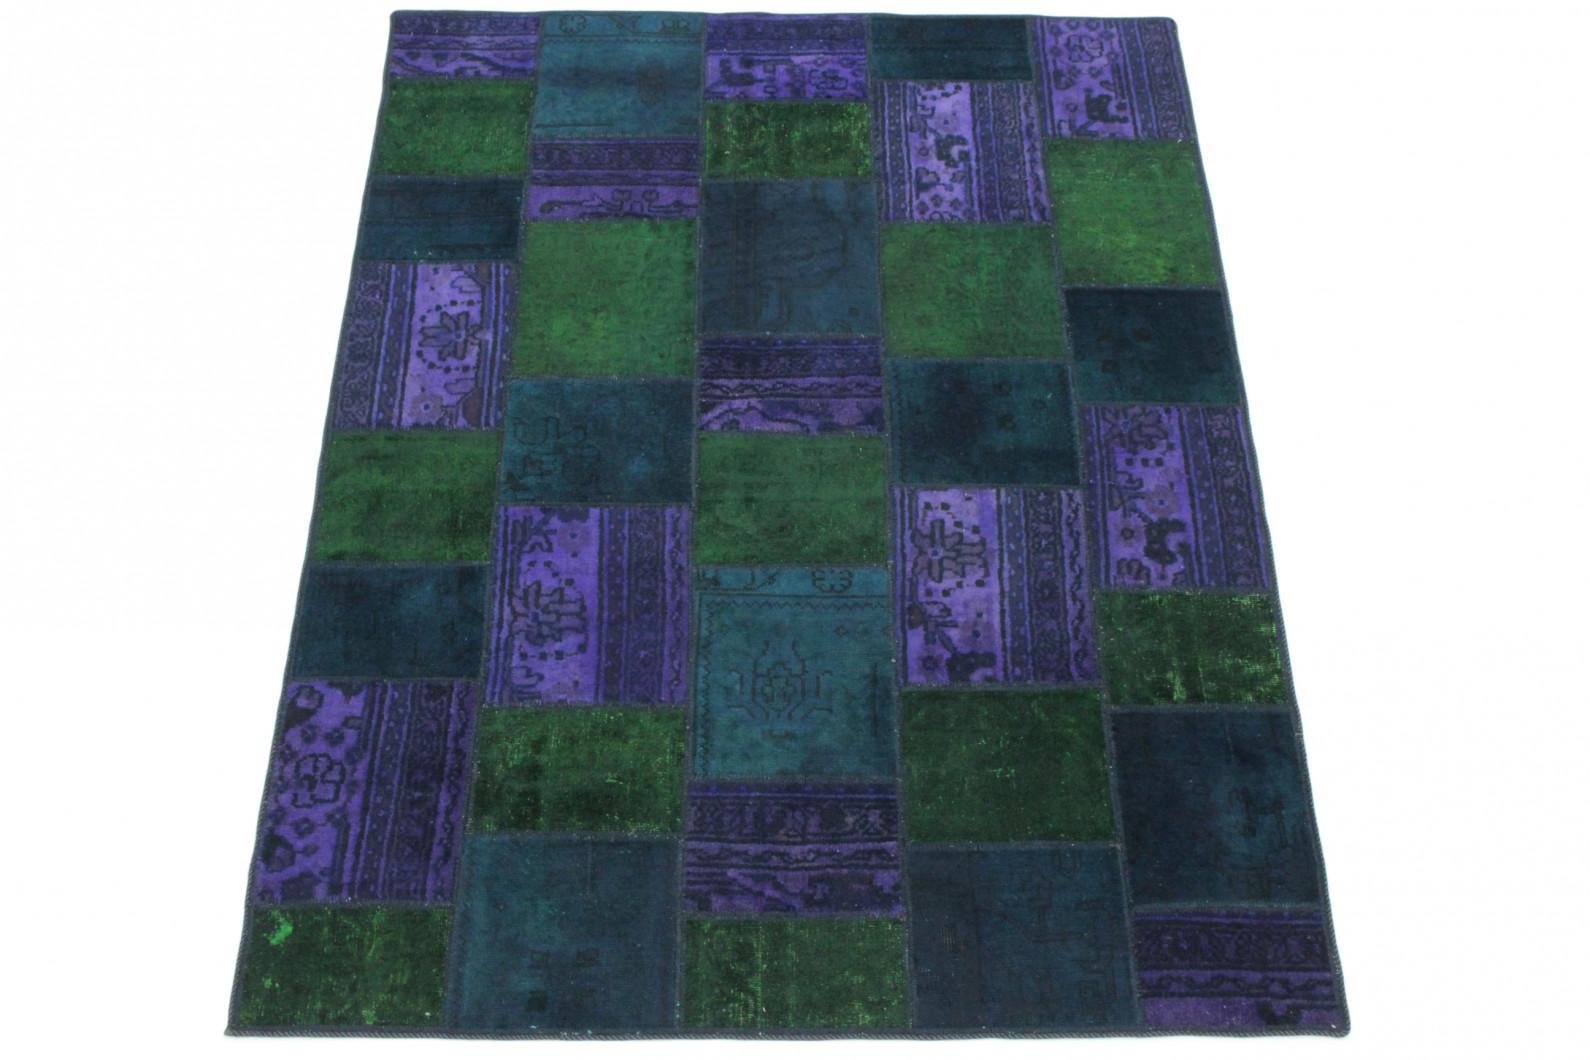 patchwork teppich gr n lila blau in 210x150 1001 167141 bei kaufen. Black Bedroom Furniture Sets. Home Design Ideas